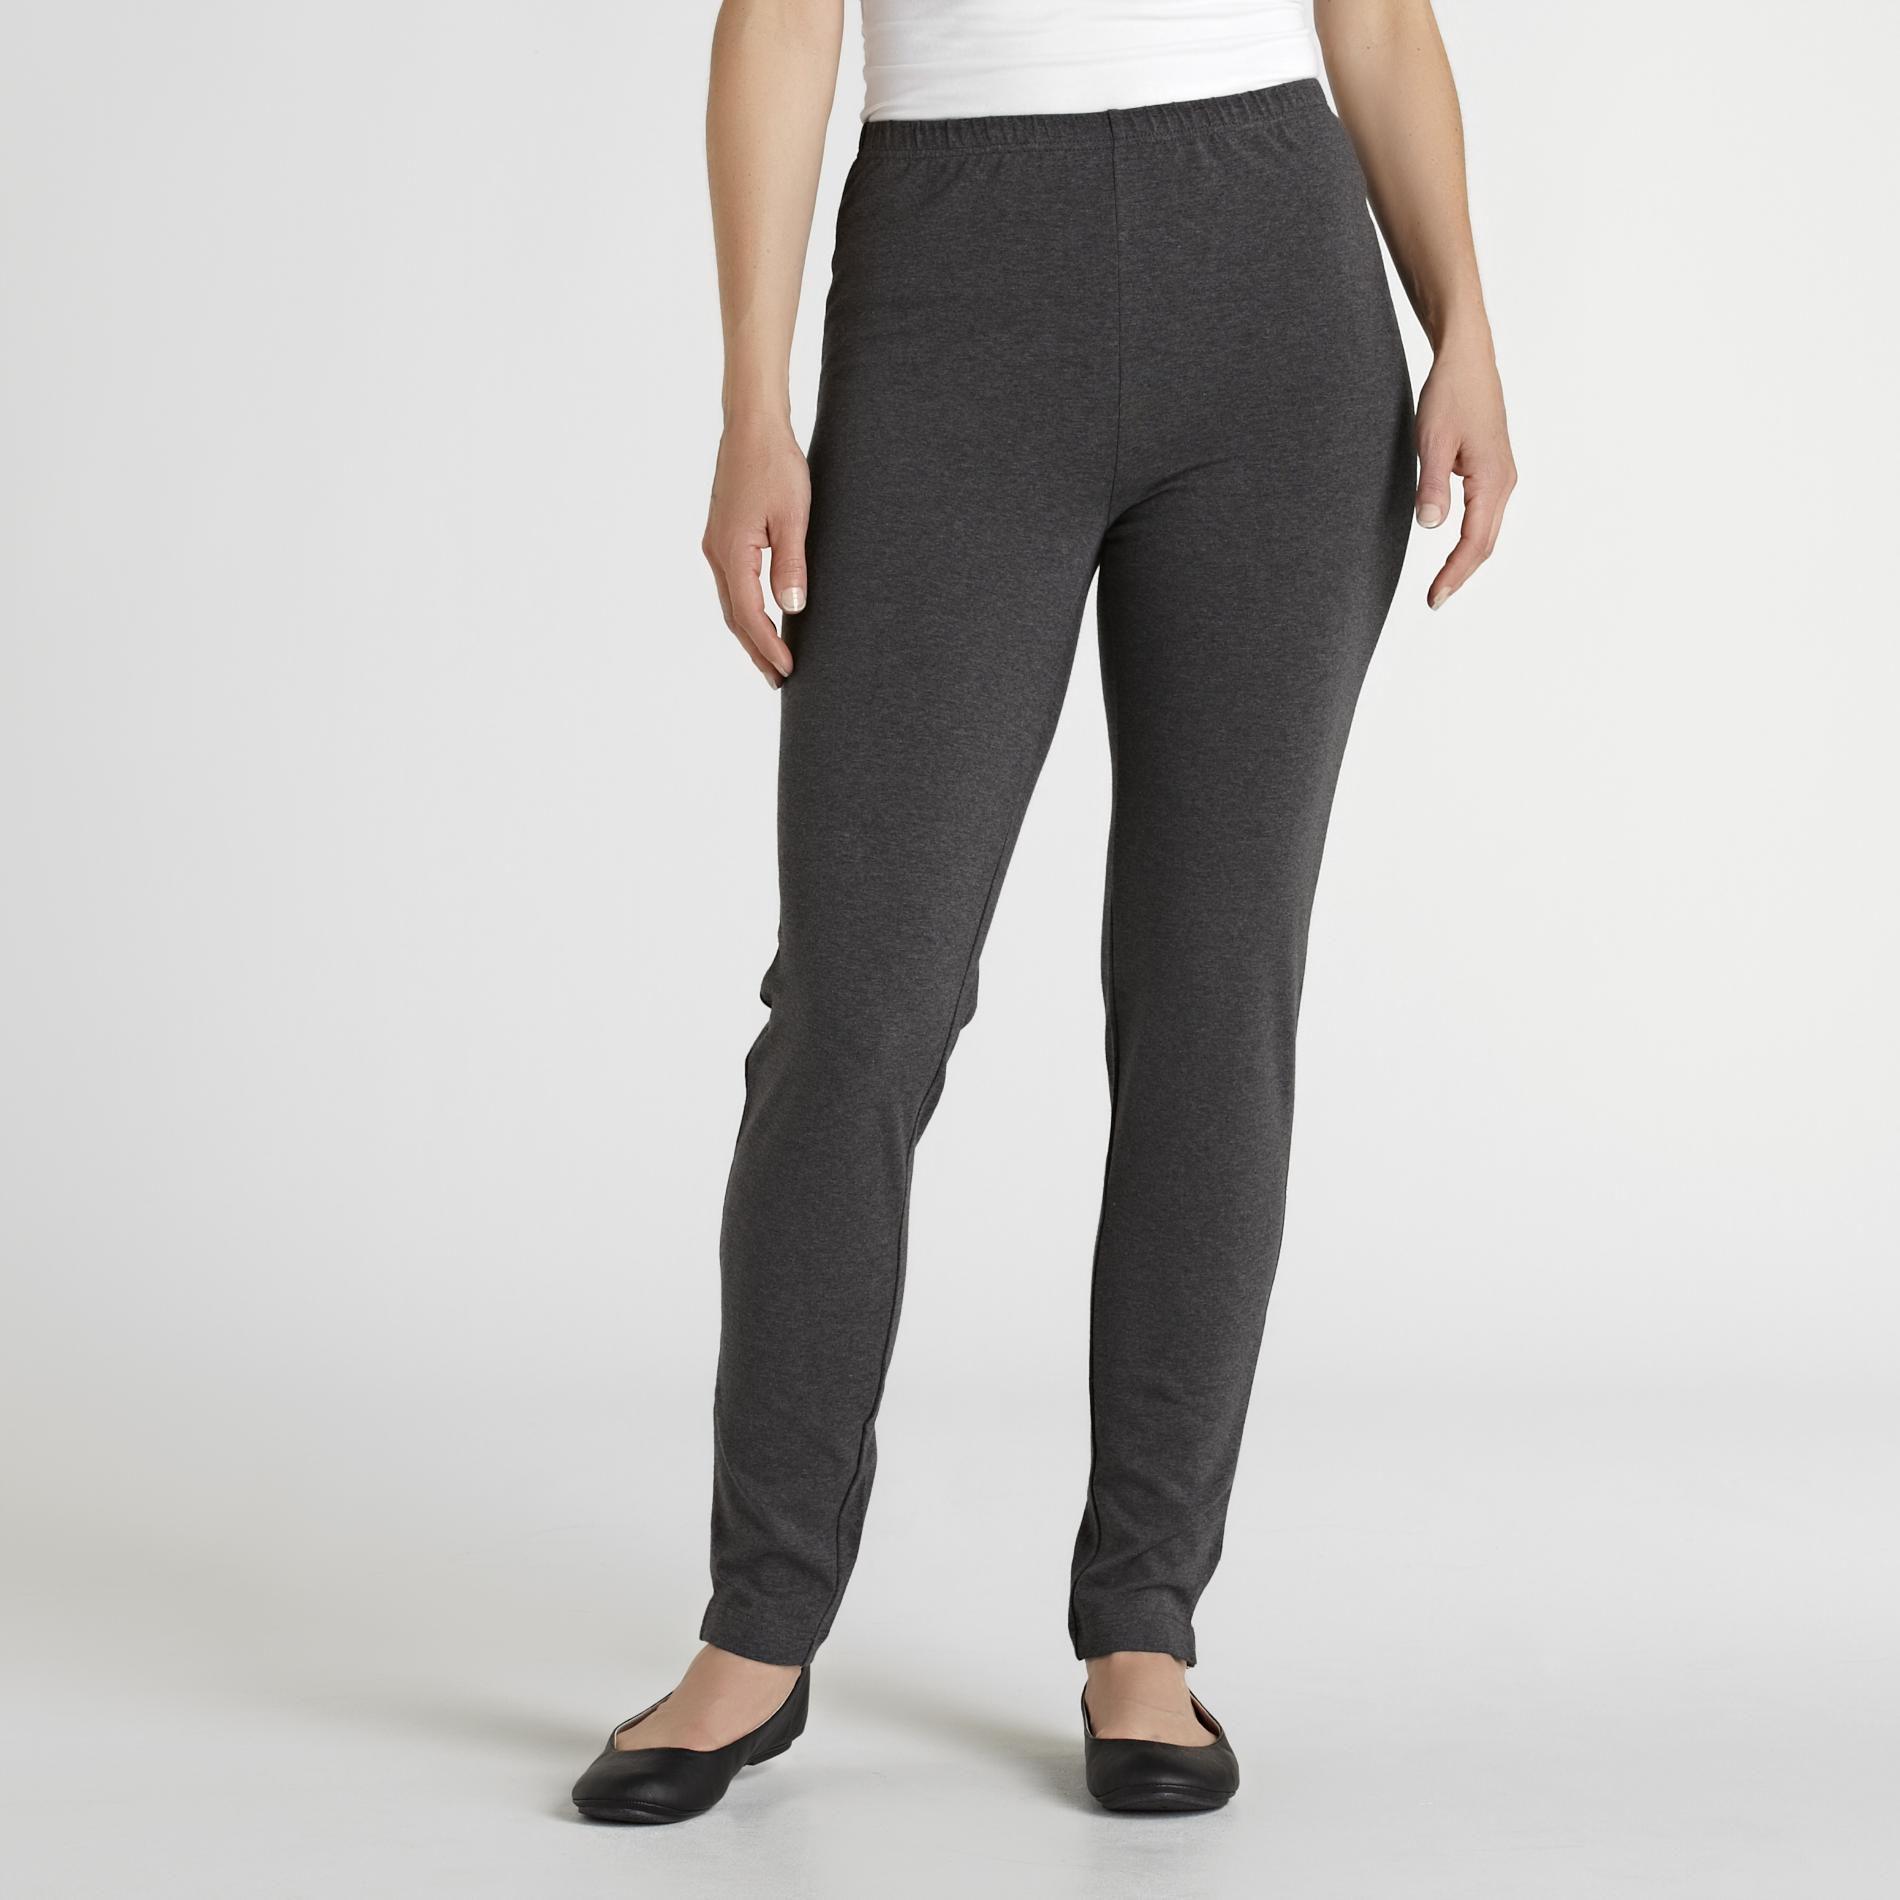 Basic Editions Women' Knit Leggings